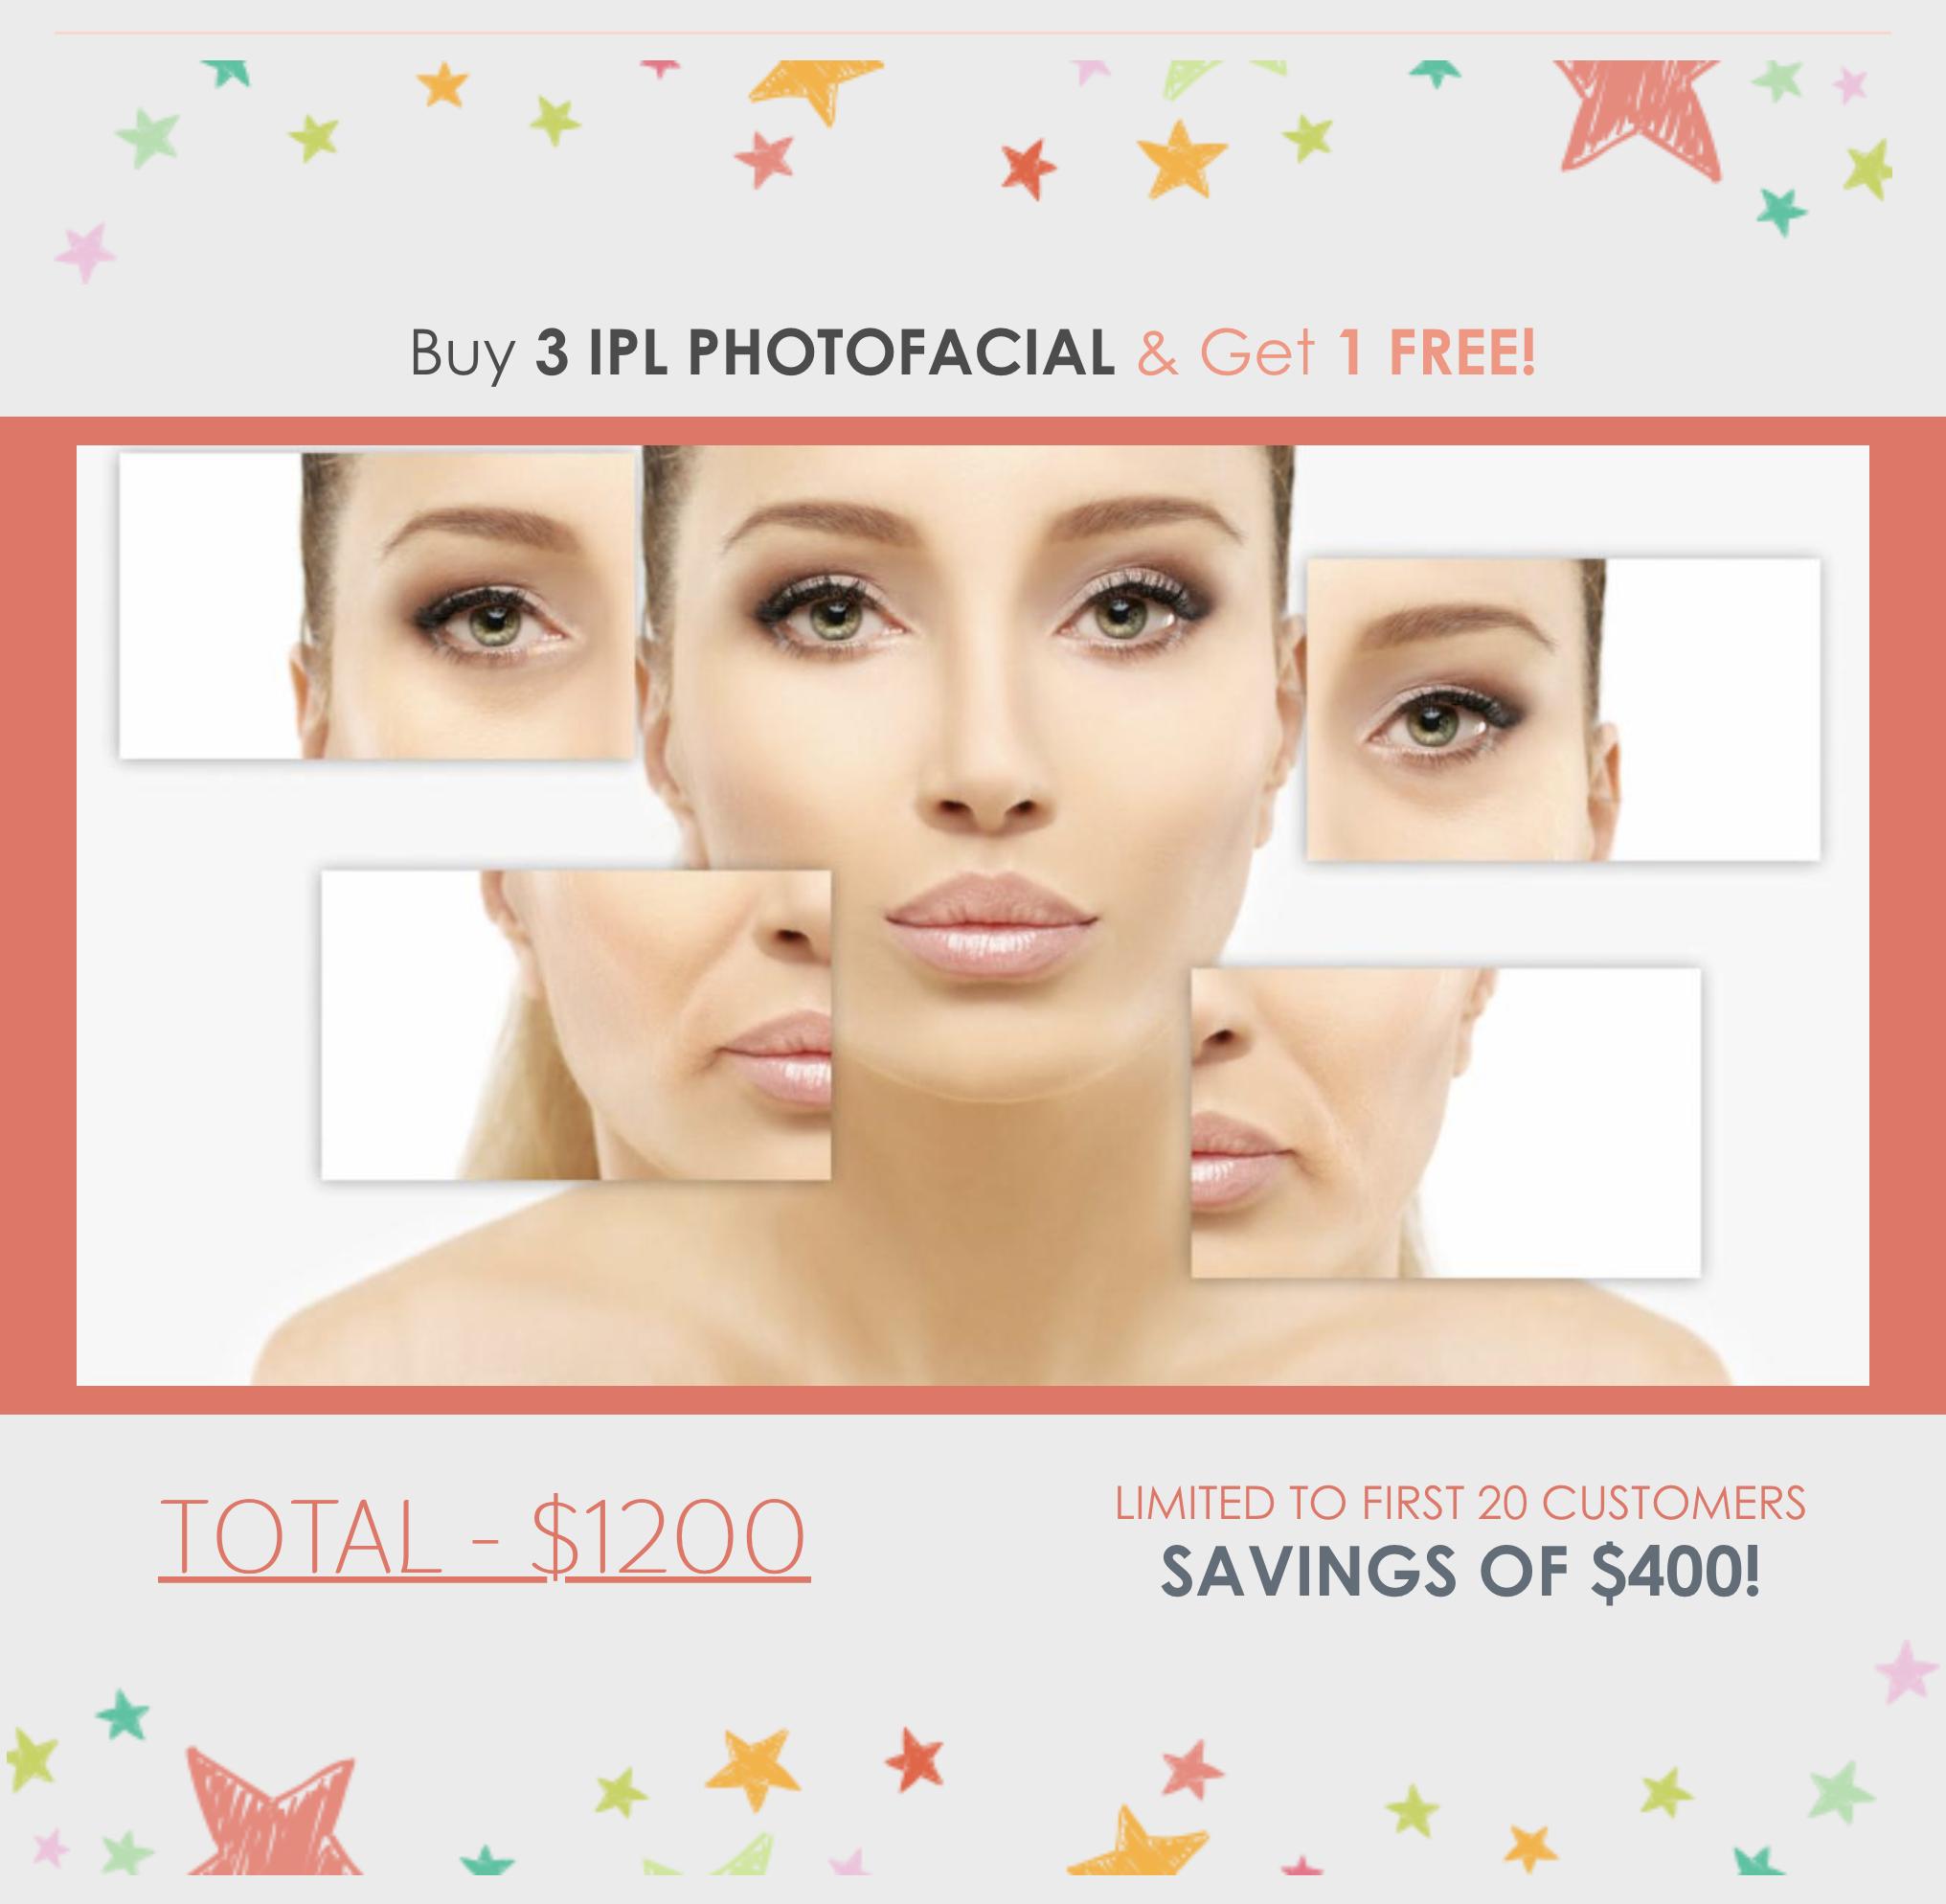 anti-aging-promo-offer-ipl-photfacial-spot-pigmentation-laser treatment-near-me